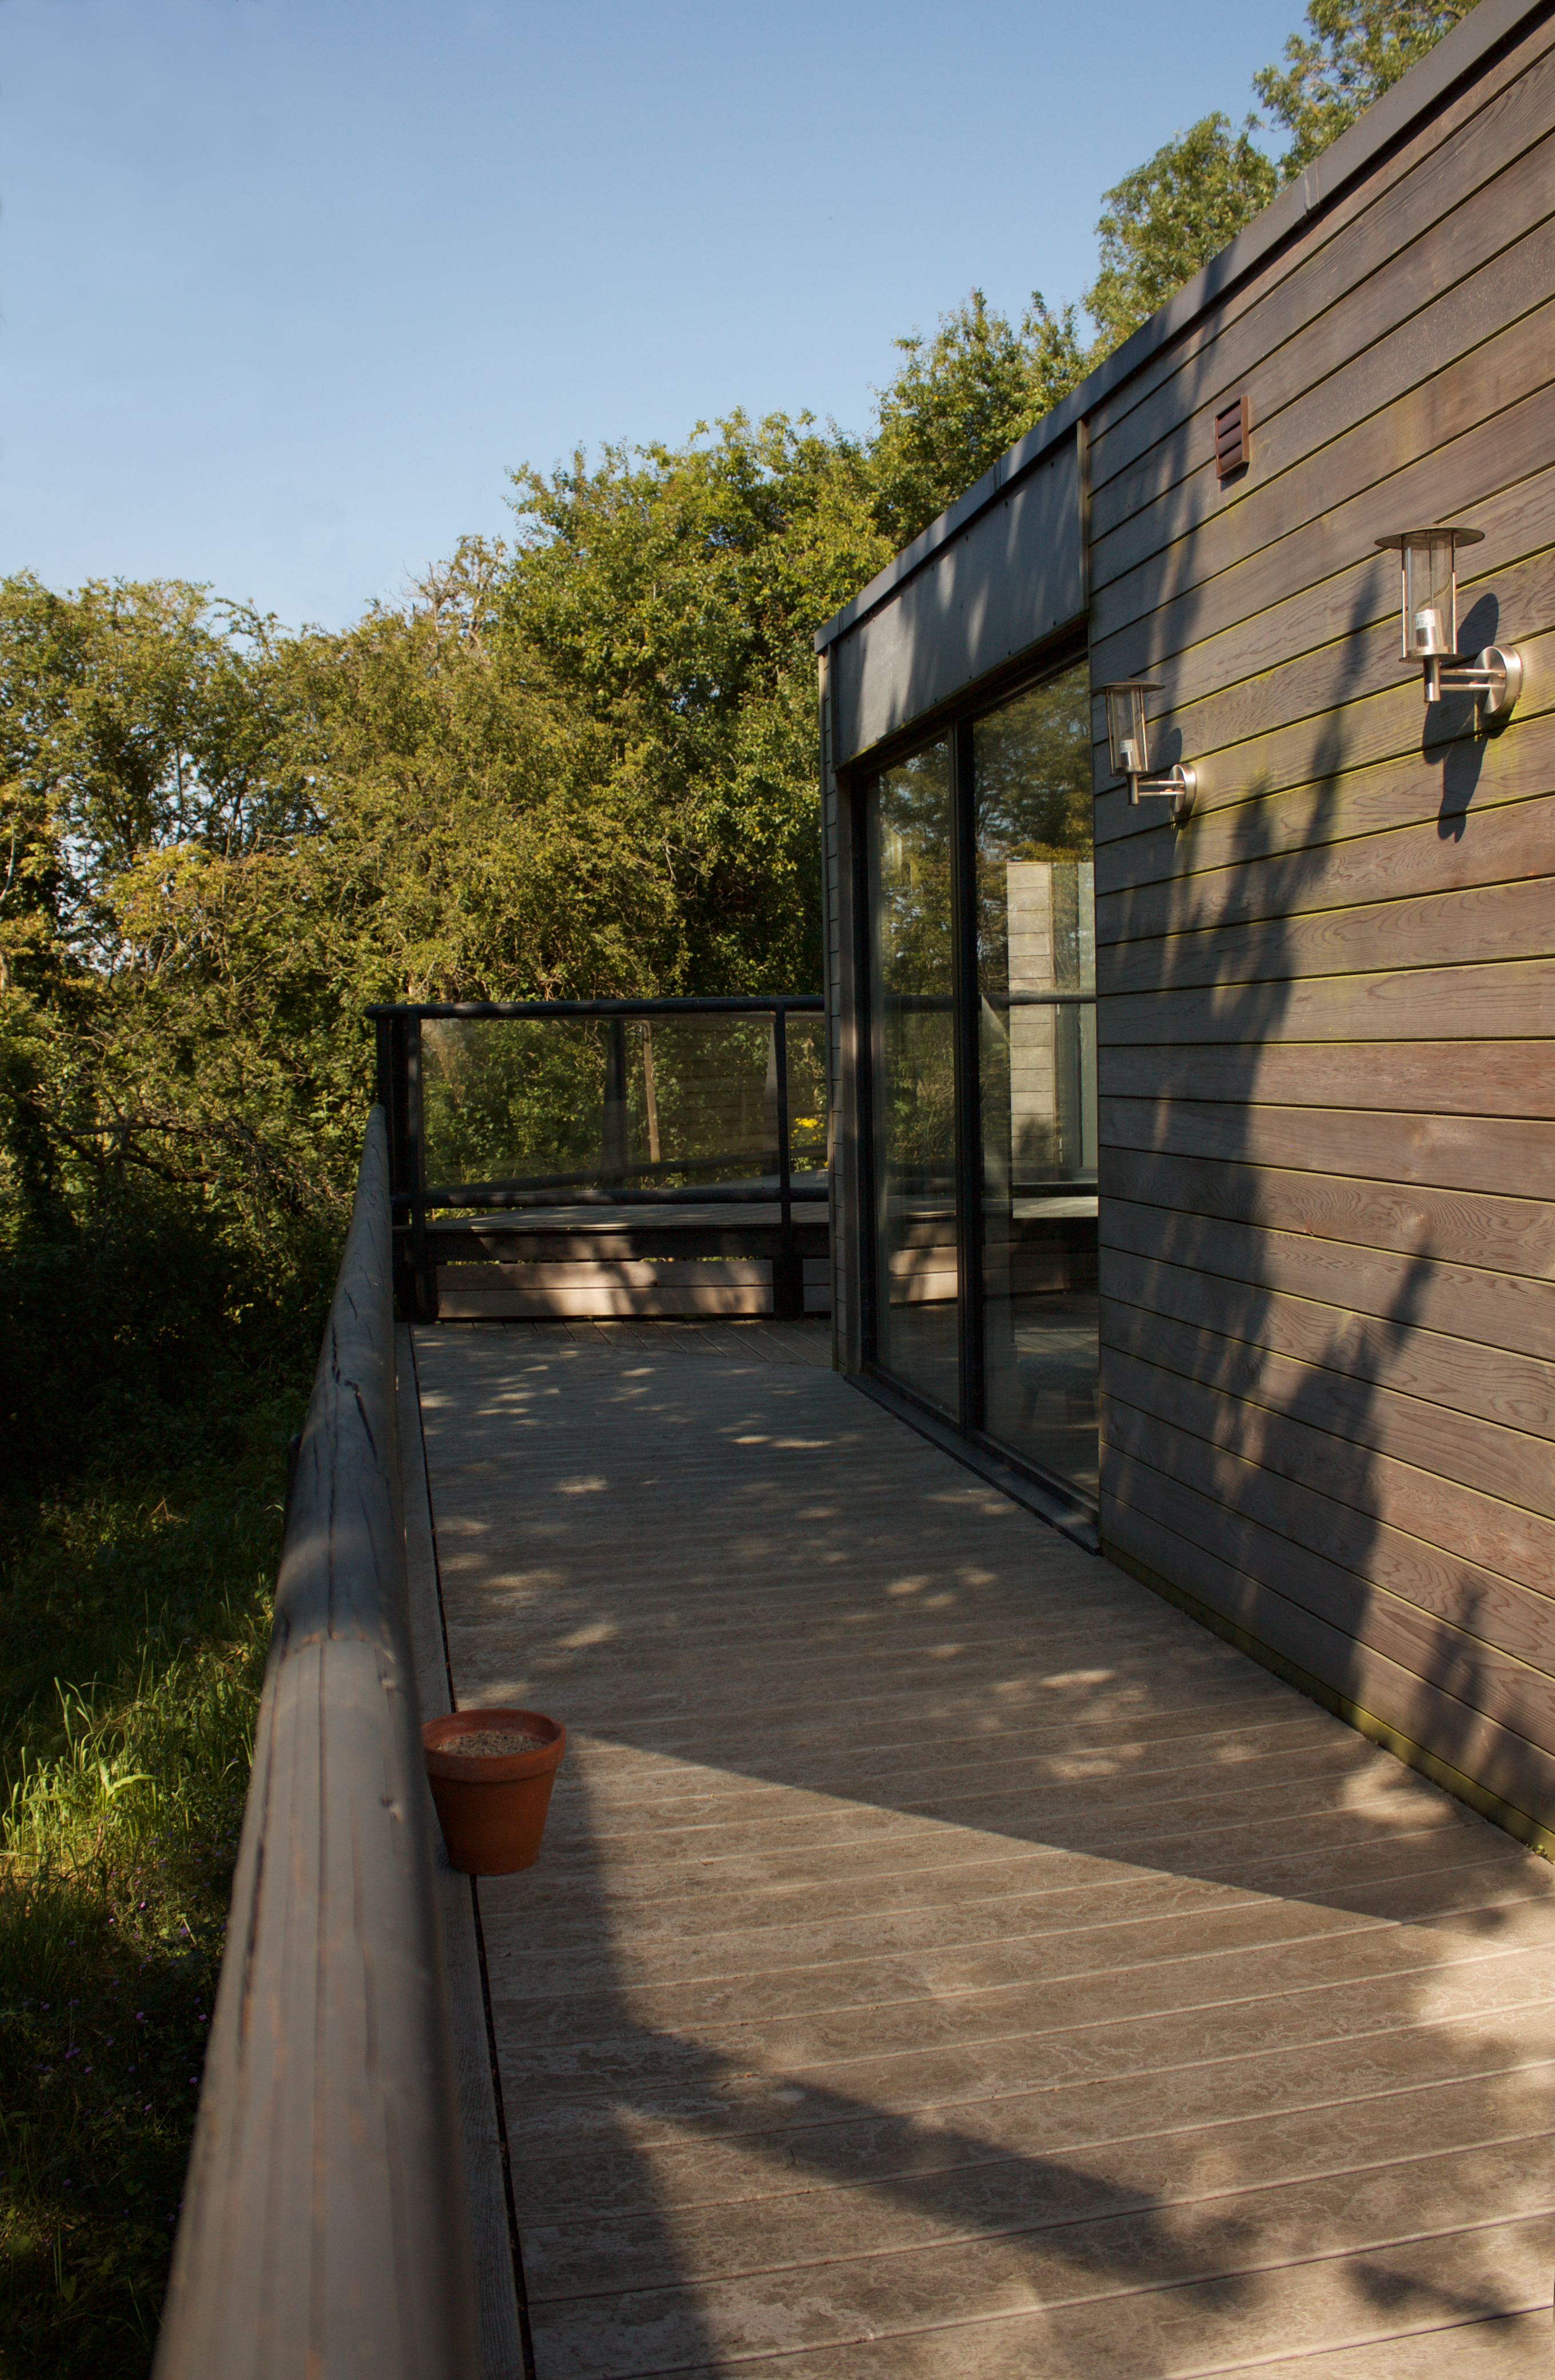 Eco Lodges Clophill Nicolas Tye Architects